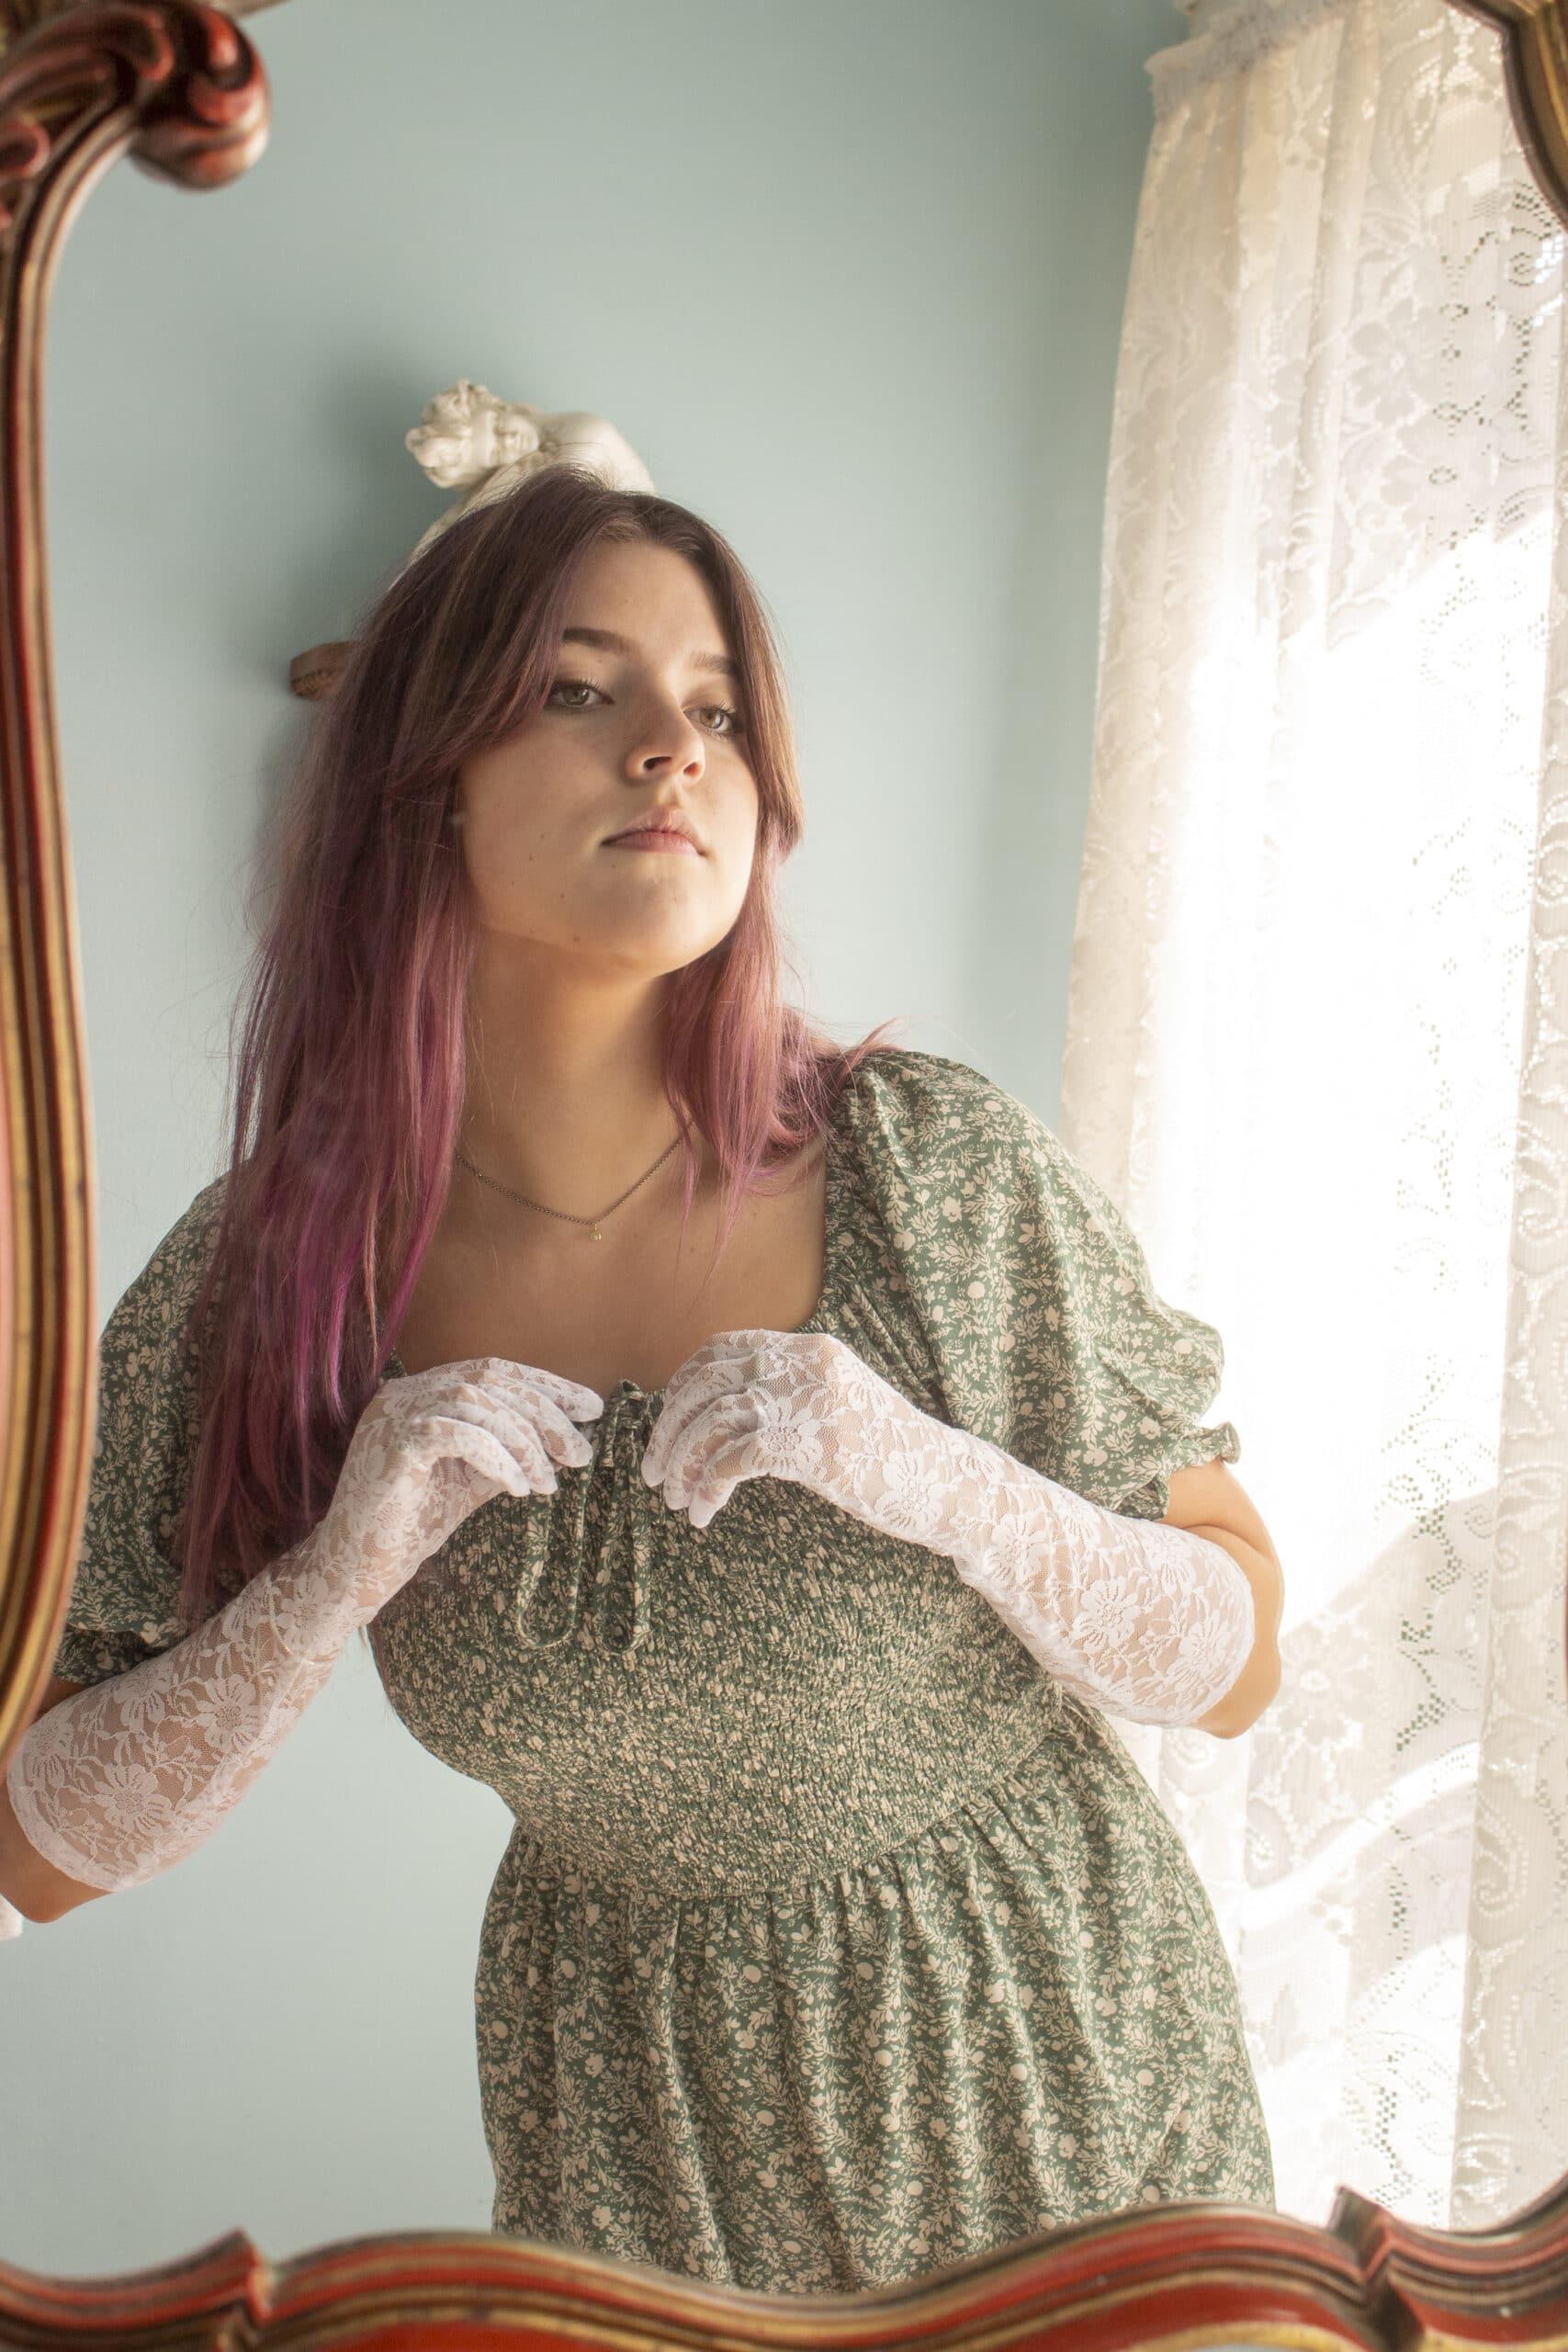 photo shoot Marion Hall